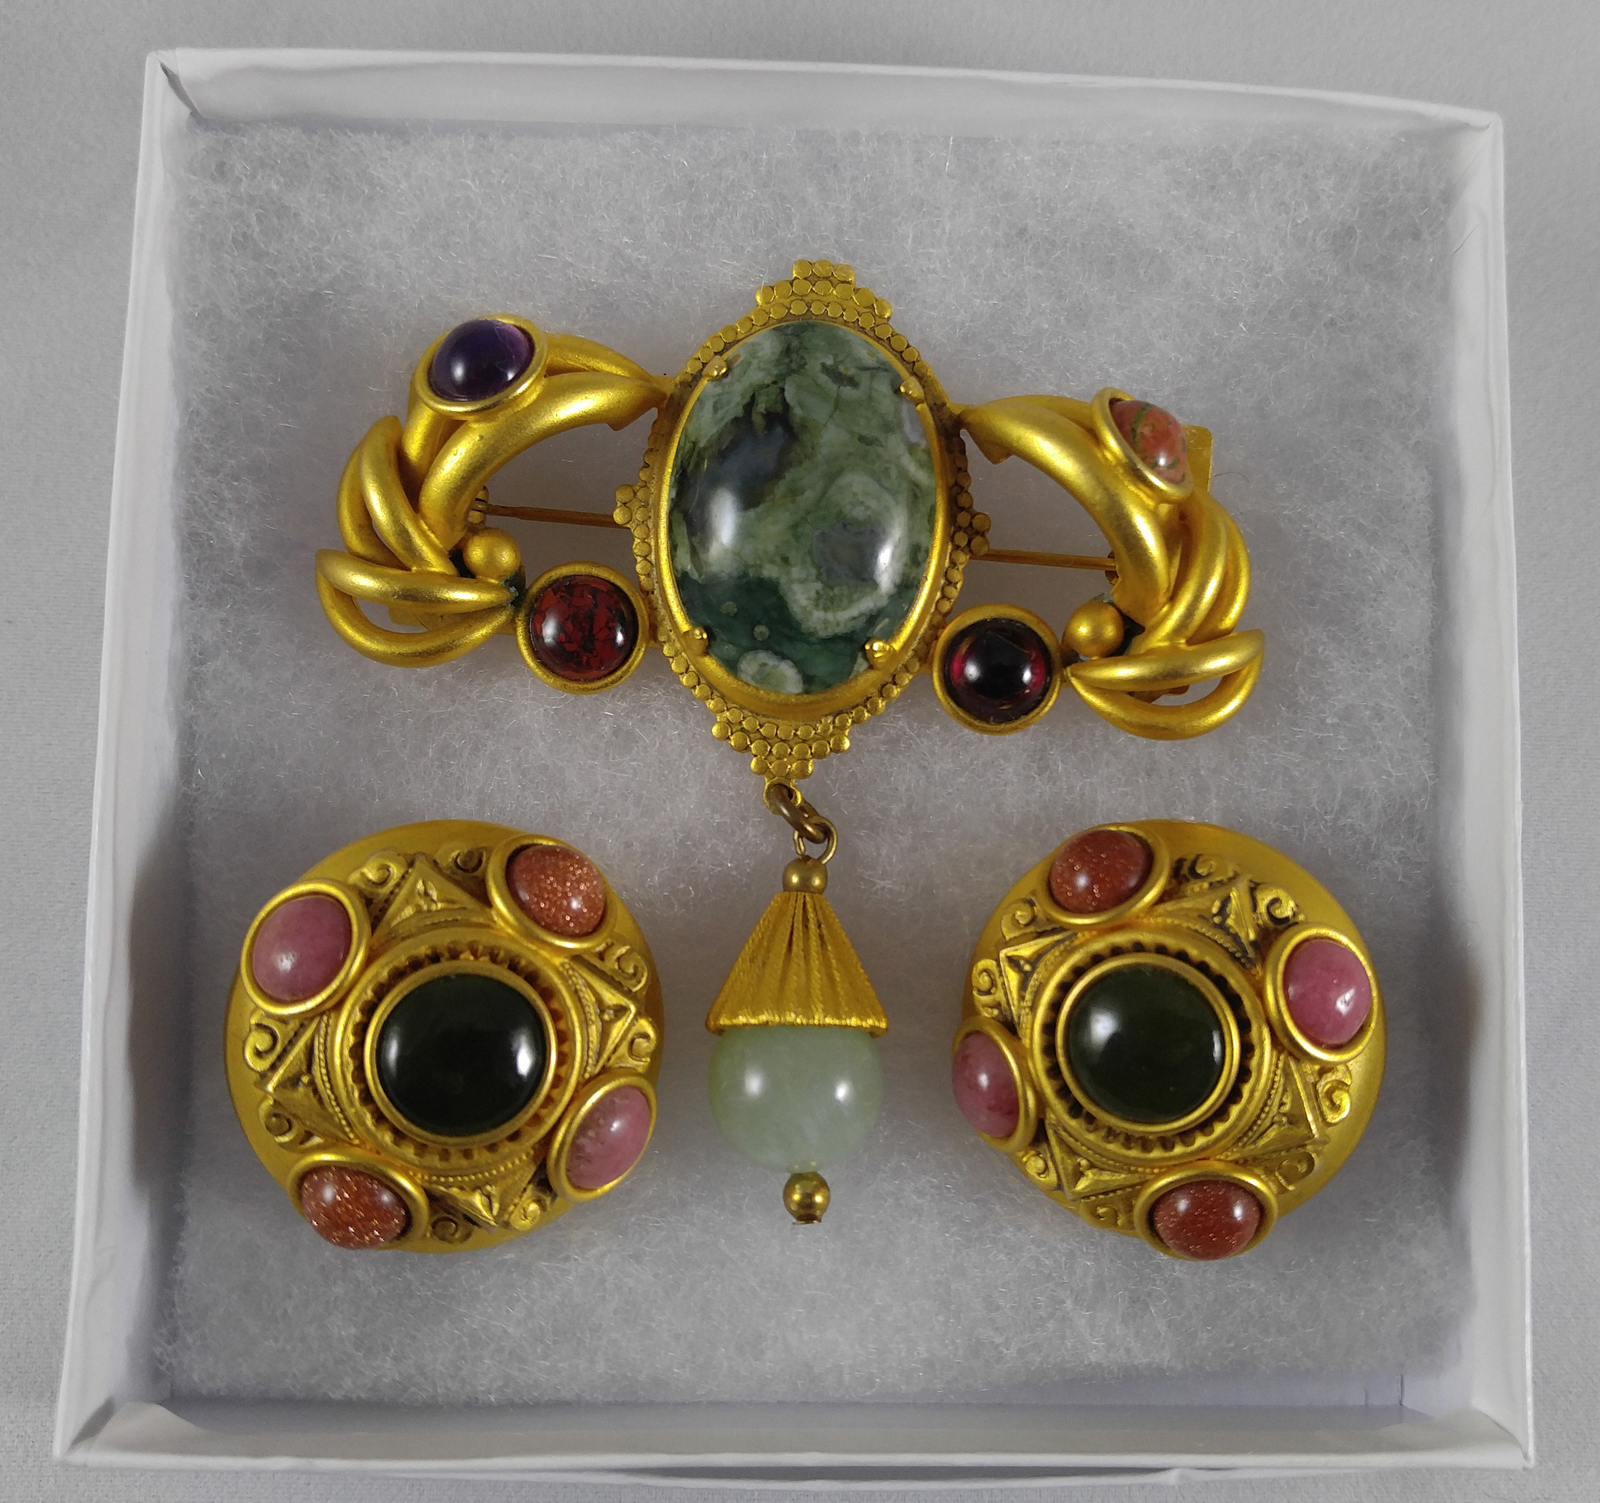 Vintage 1990s Natasha Stambouli Designer 18 K Gold Plated Brooch Pin Ear Clips